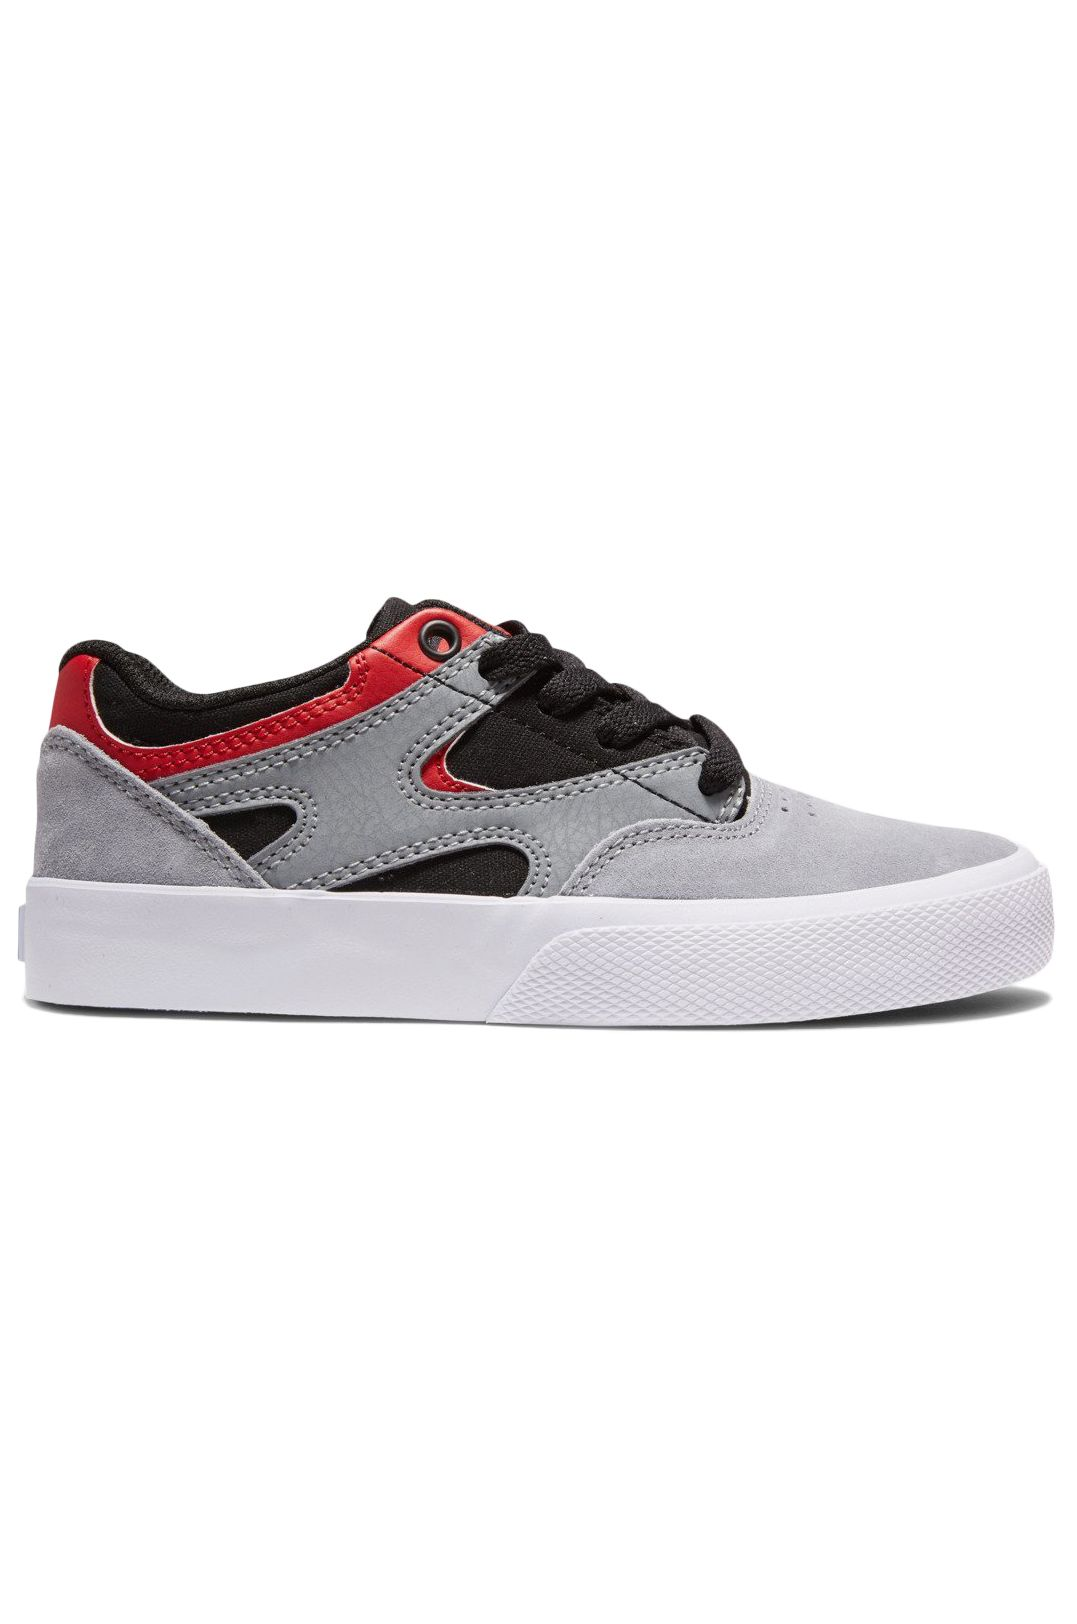 Tenis DC Shoes KALIS VULC Black/Grey/Red